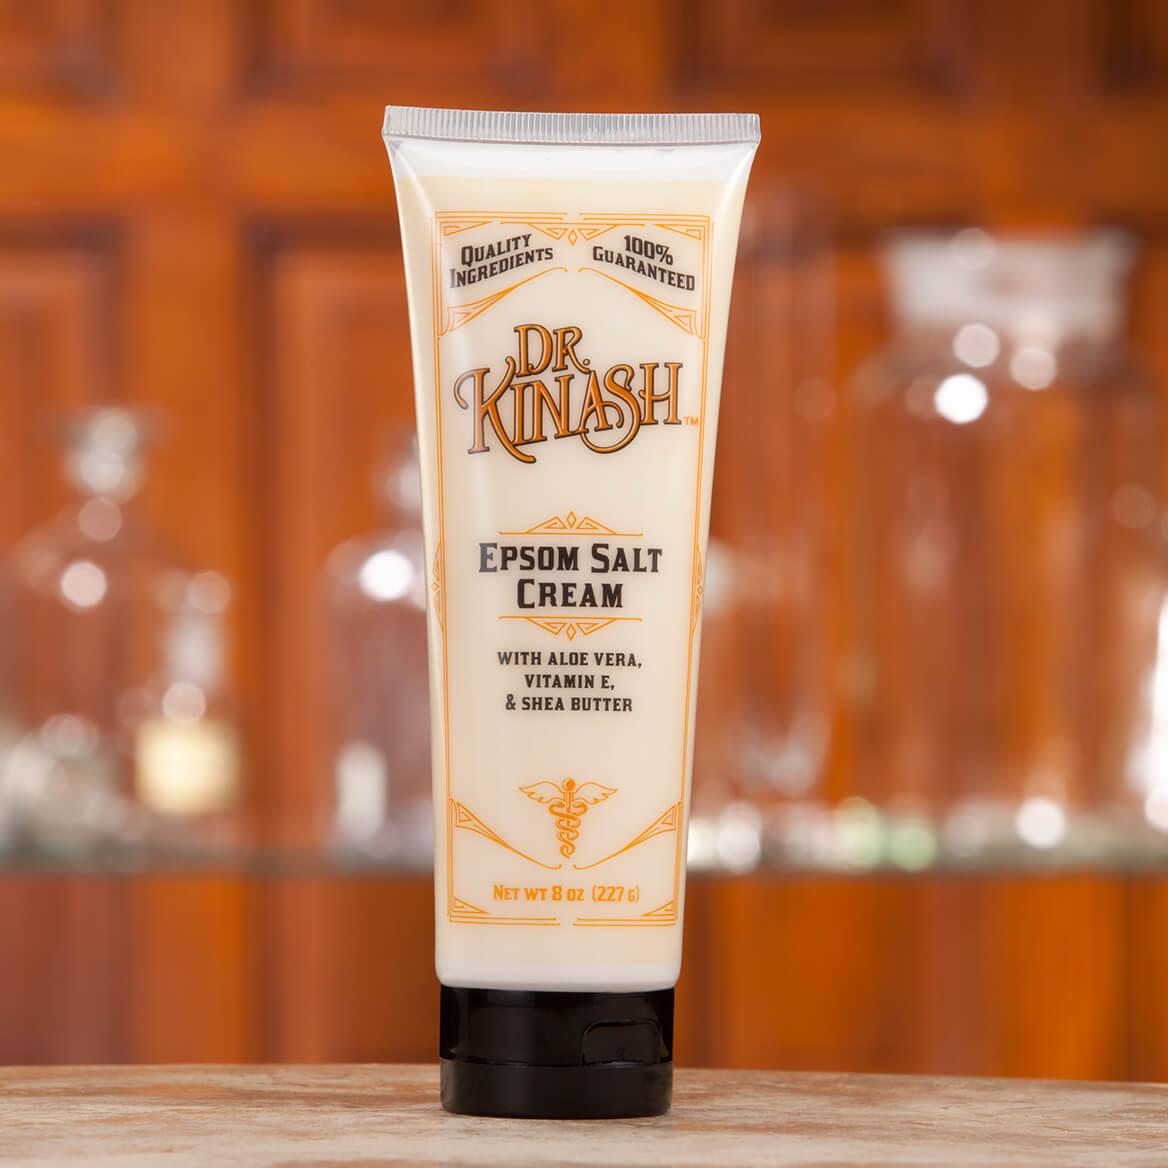 Dr. Kinash™ Epsom Salt Cream 8 oz. and Epsom Salt Rub 6 oz.-368914